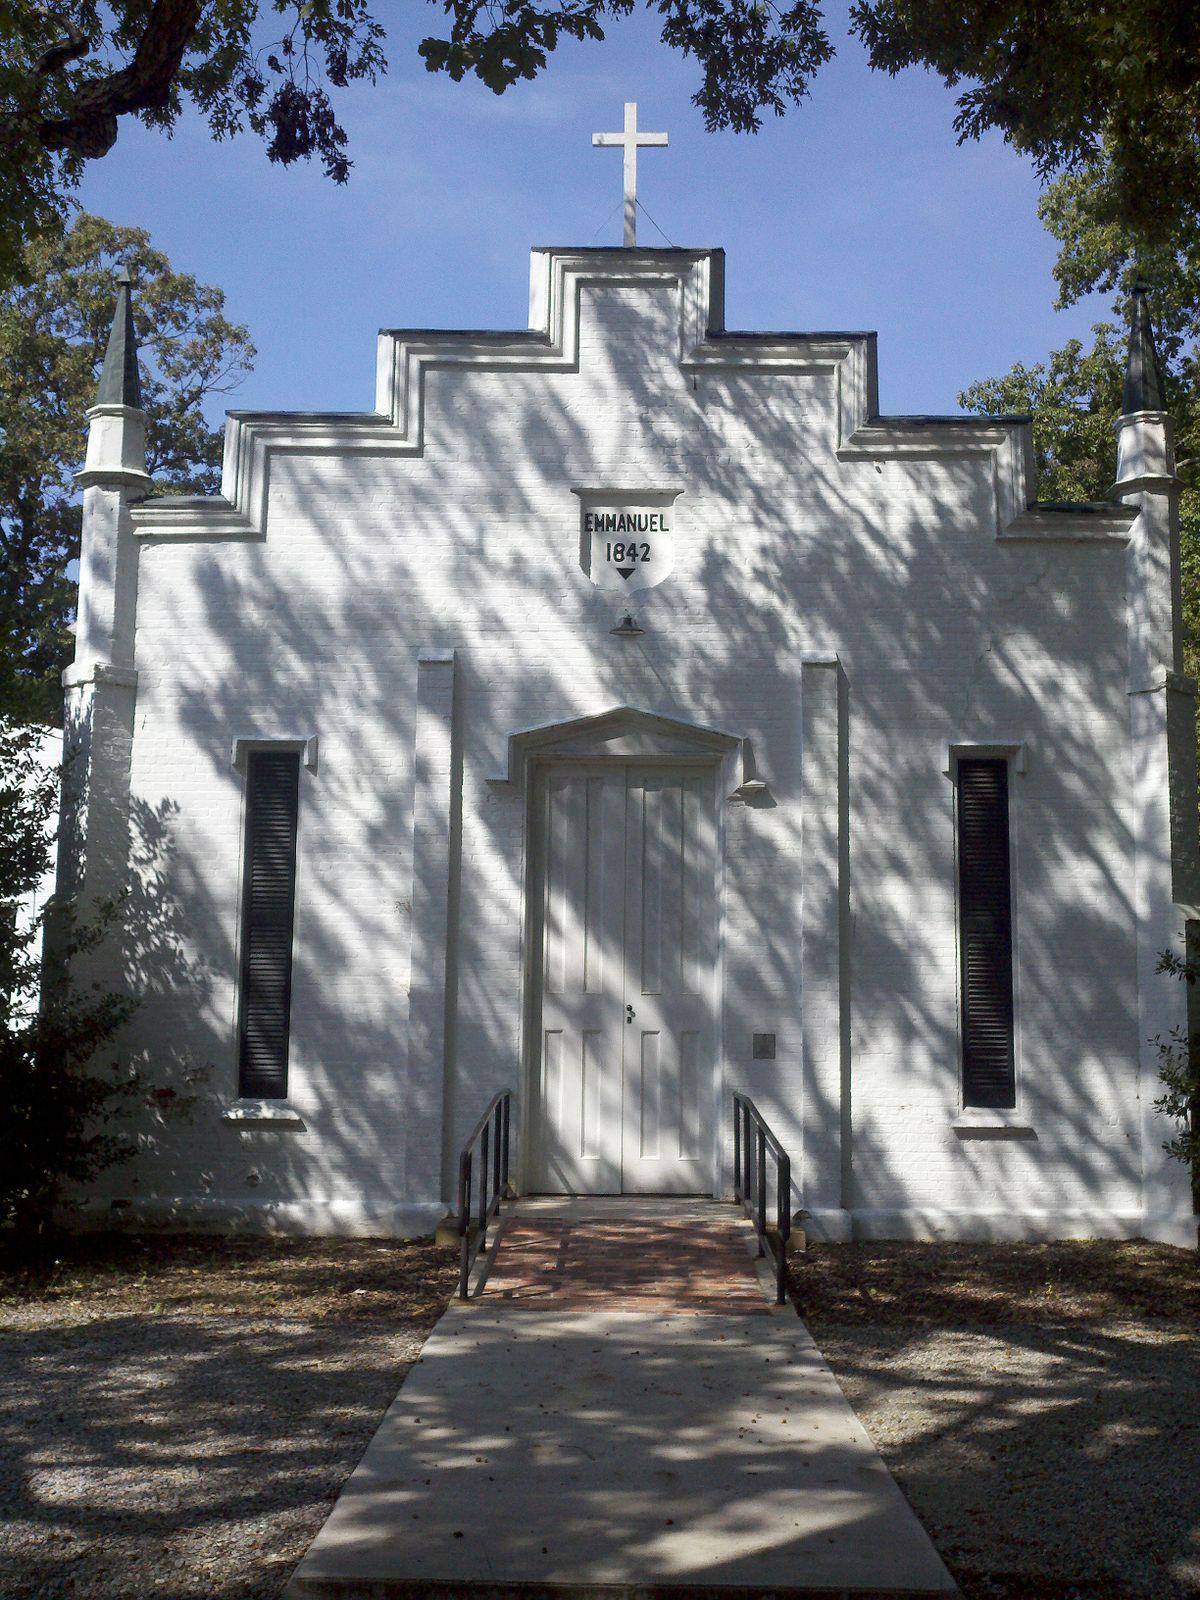 Powhatan County Building Permits